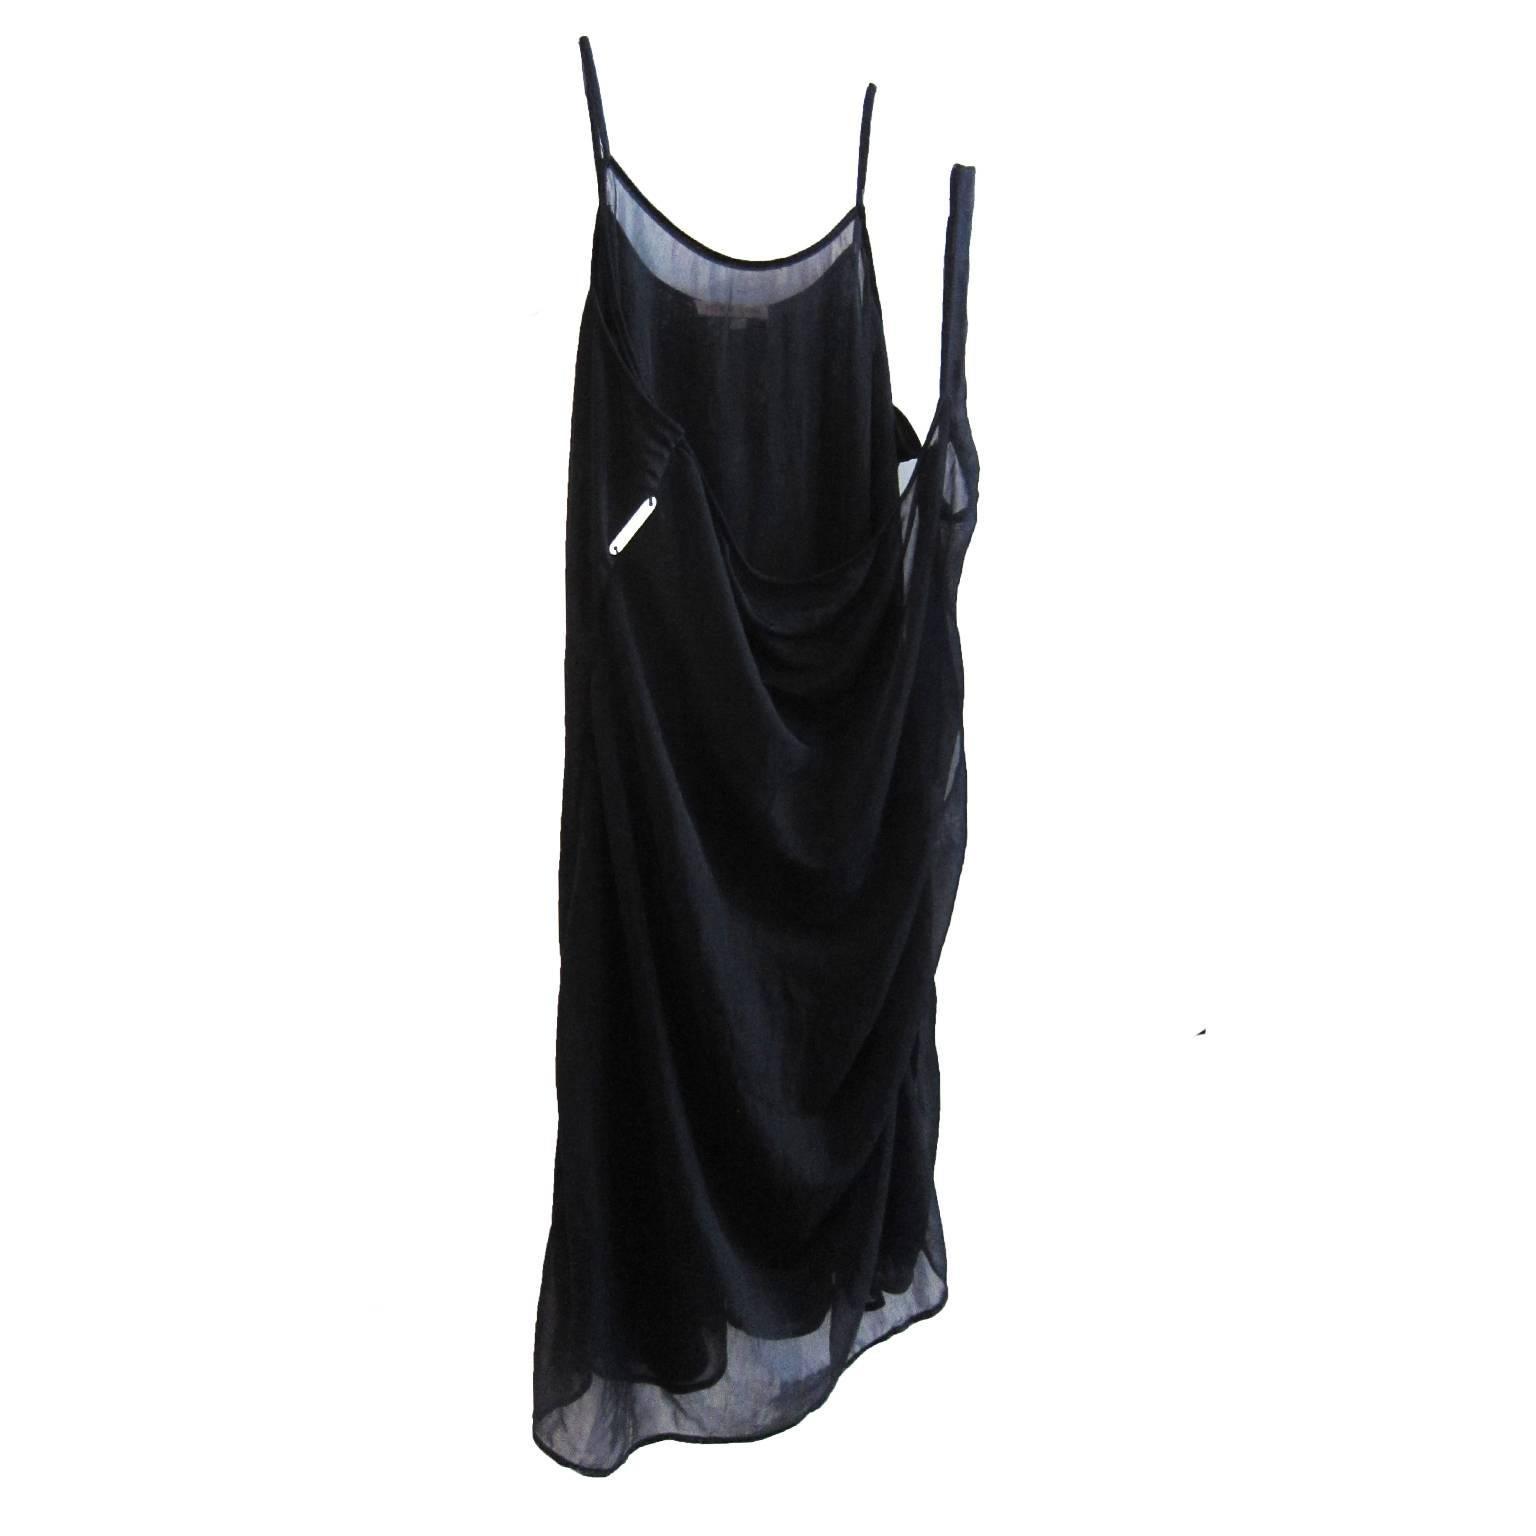 Helmut Lang Sheer Navy Layered Dress SS 1995